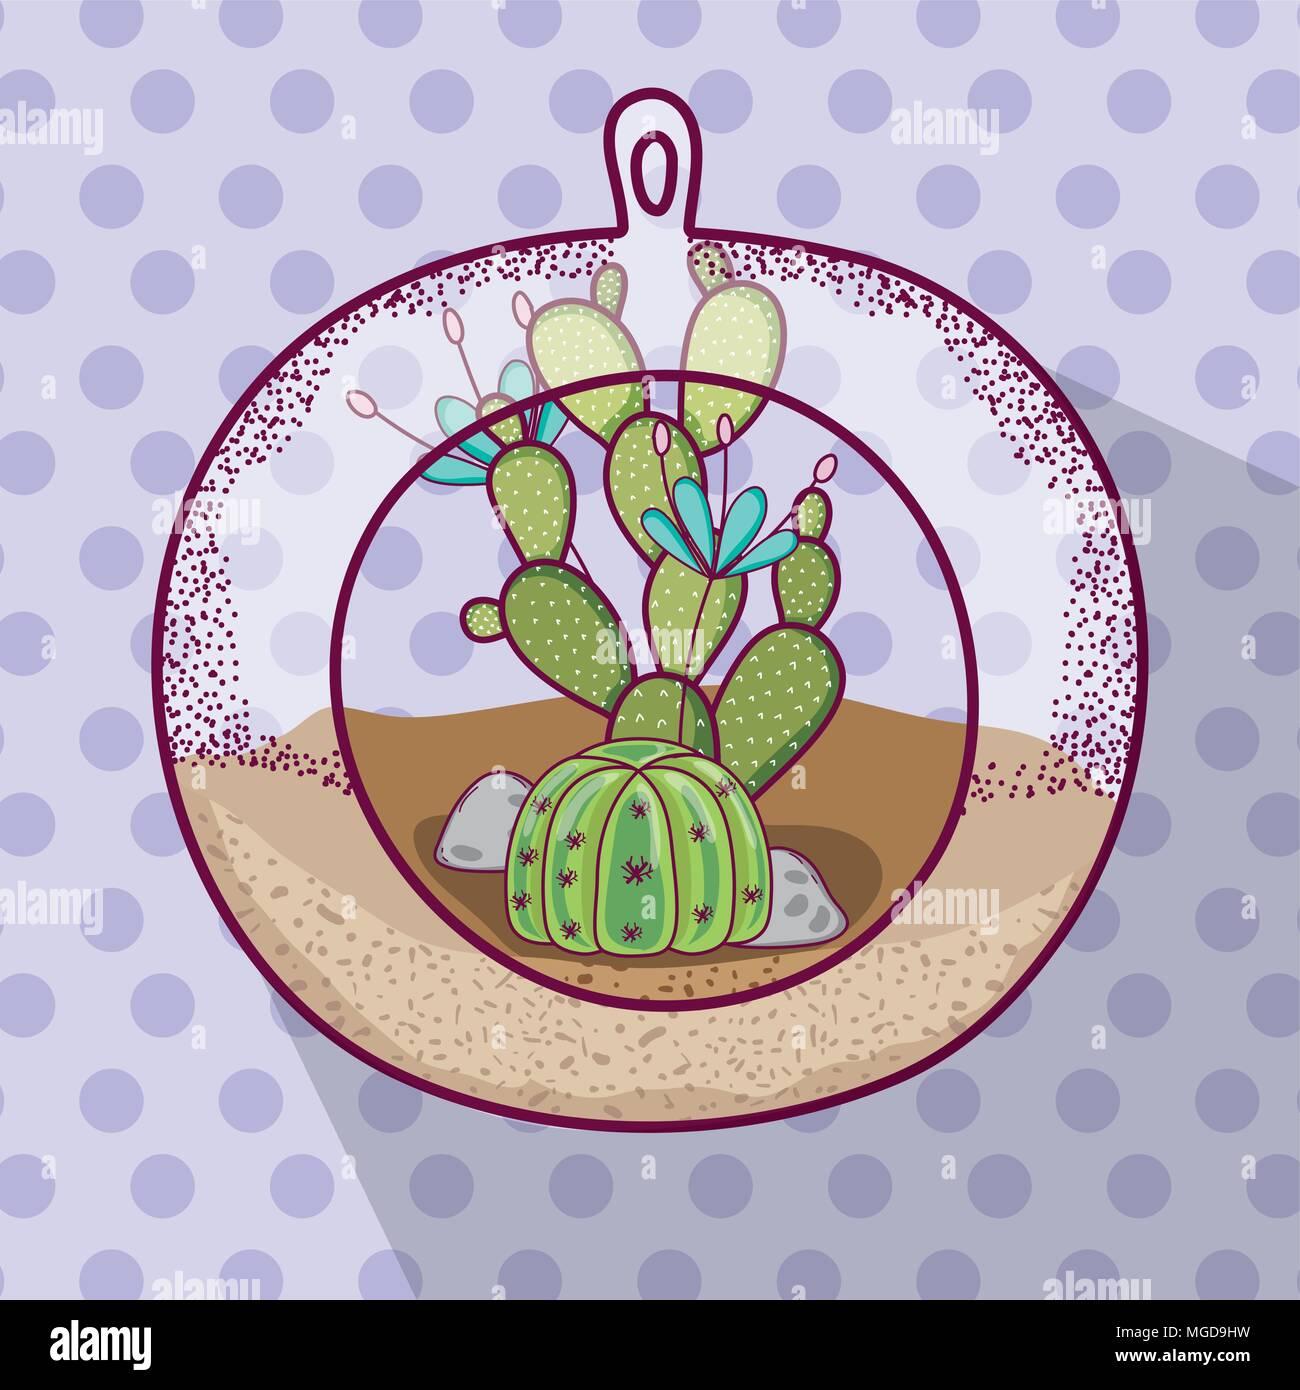 Plant inside Polyhedron glass - Stock Image